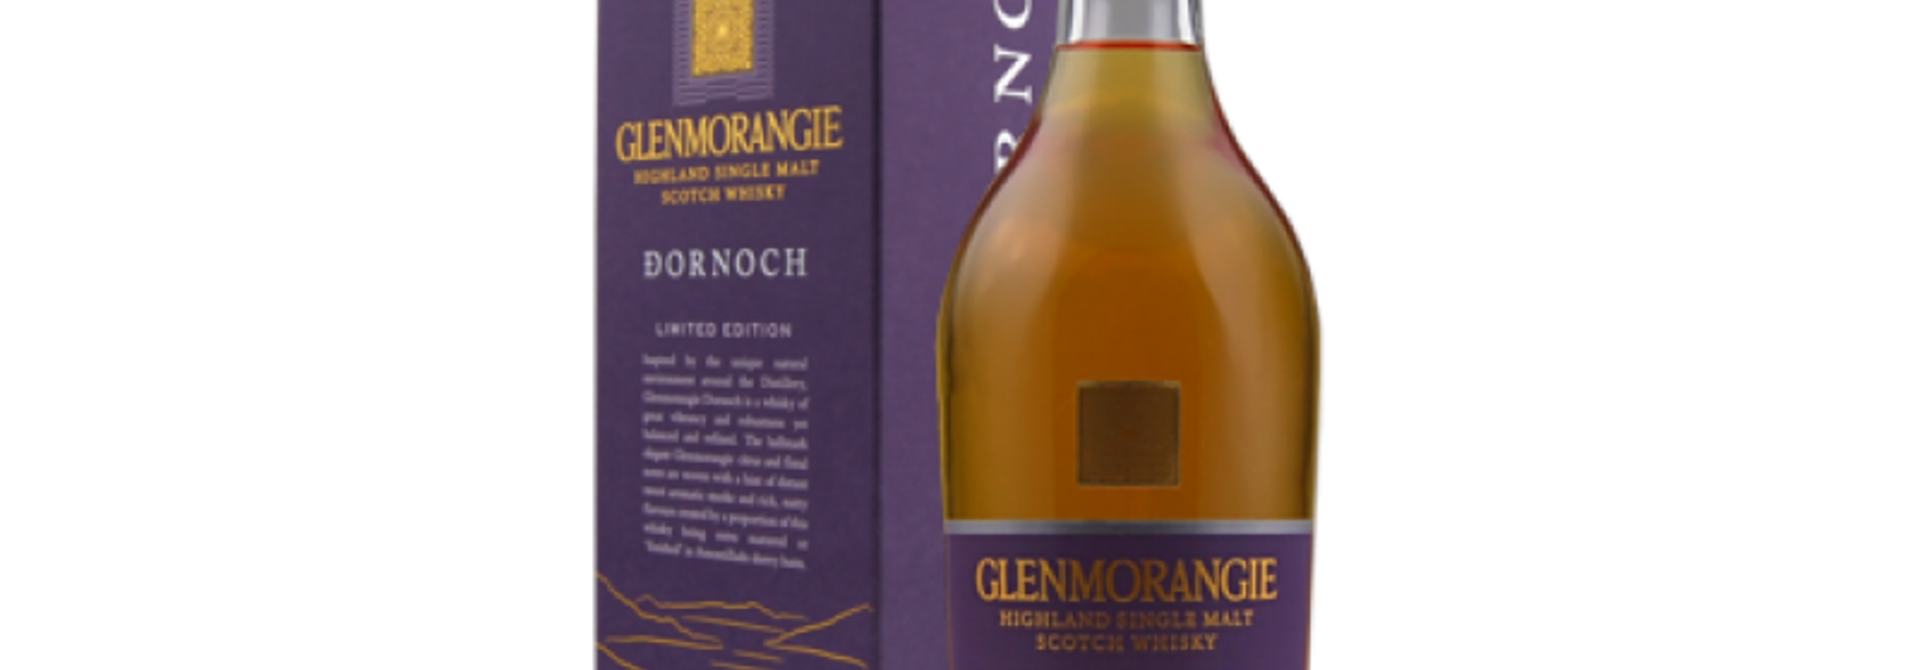 GLENMORANGIE Dornoch 0.7ltr